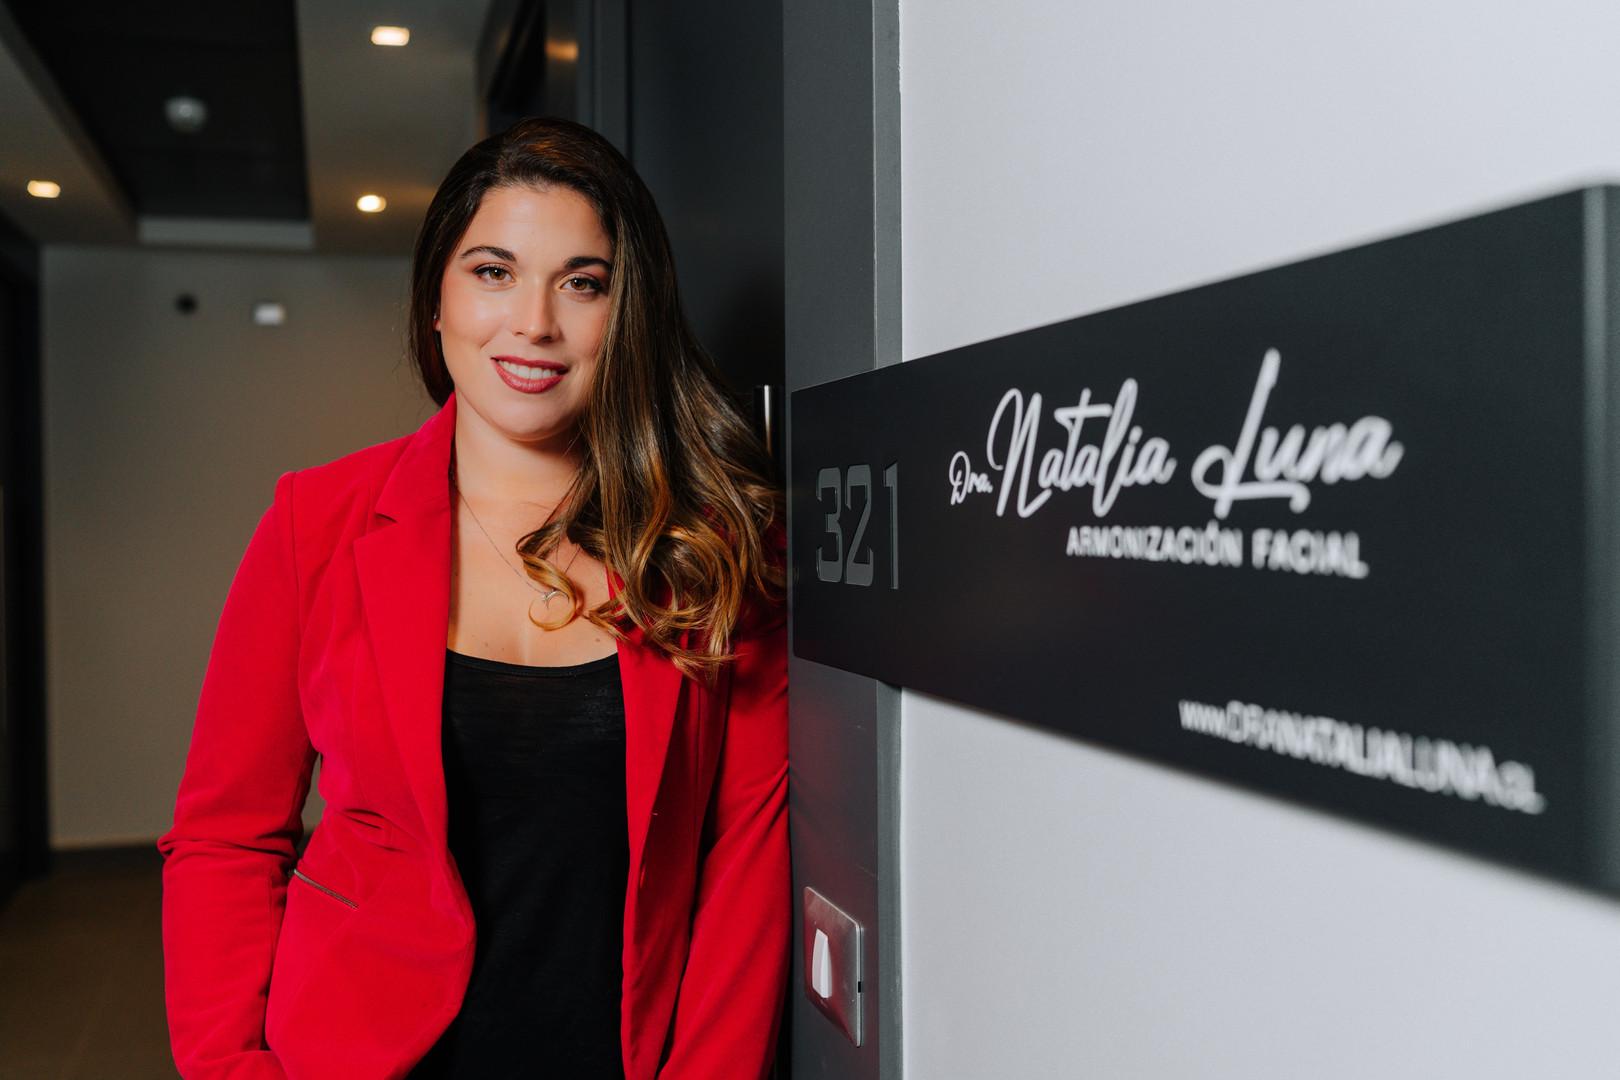 Clinica Dra Natalia Luna.jpg